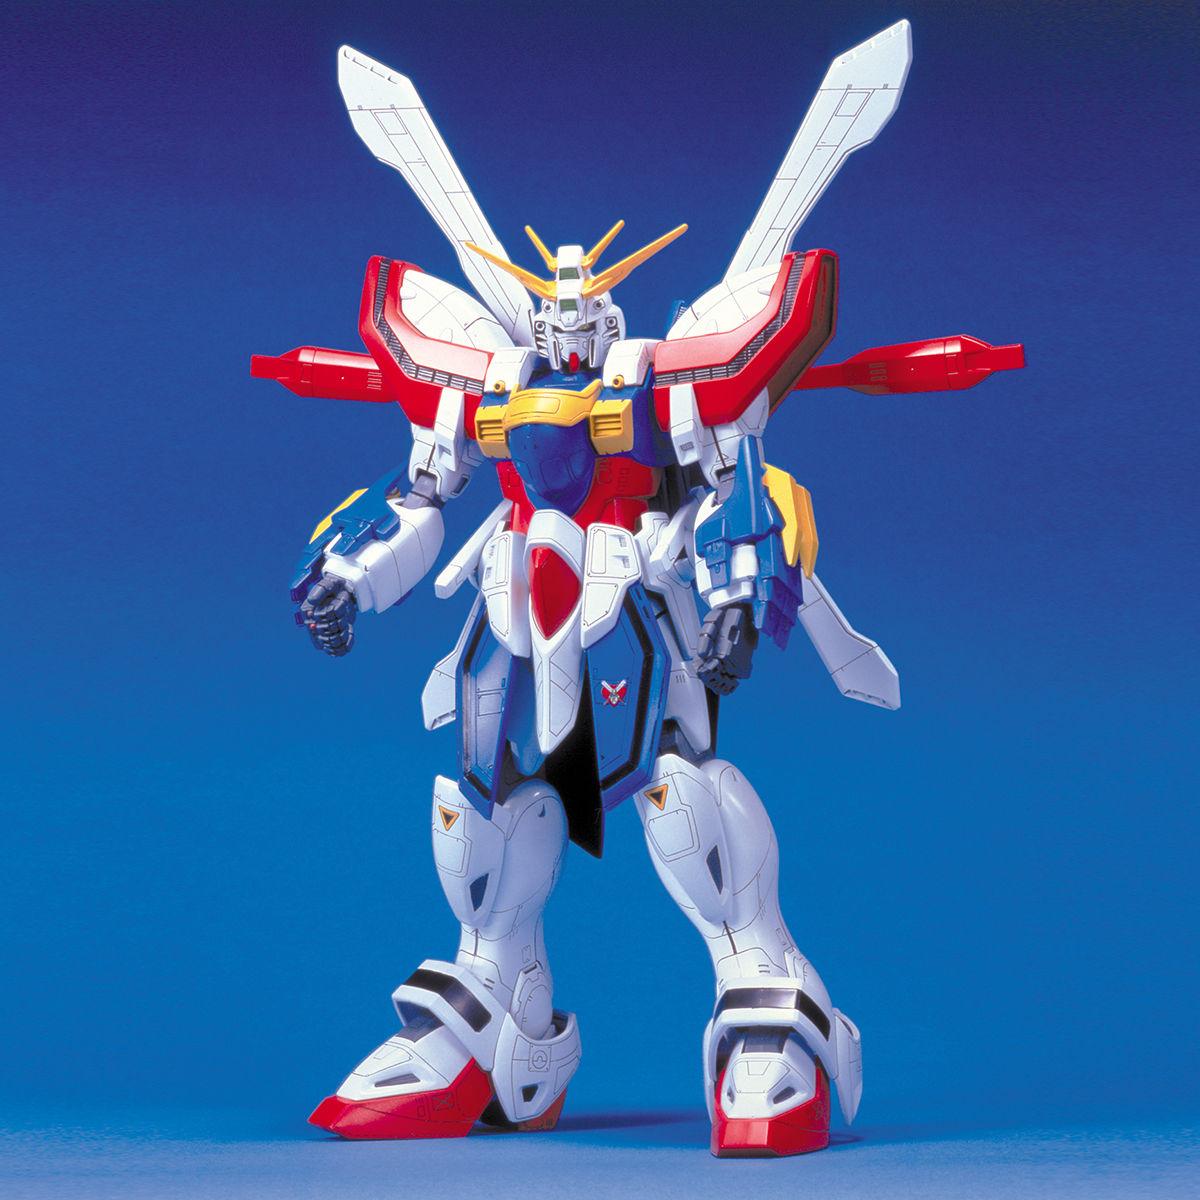 868481/60 GF13-017NJII ゴッドガンダム [God Gundam]